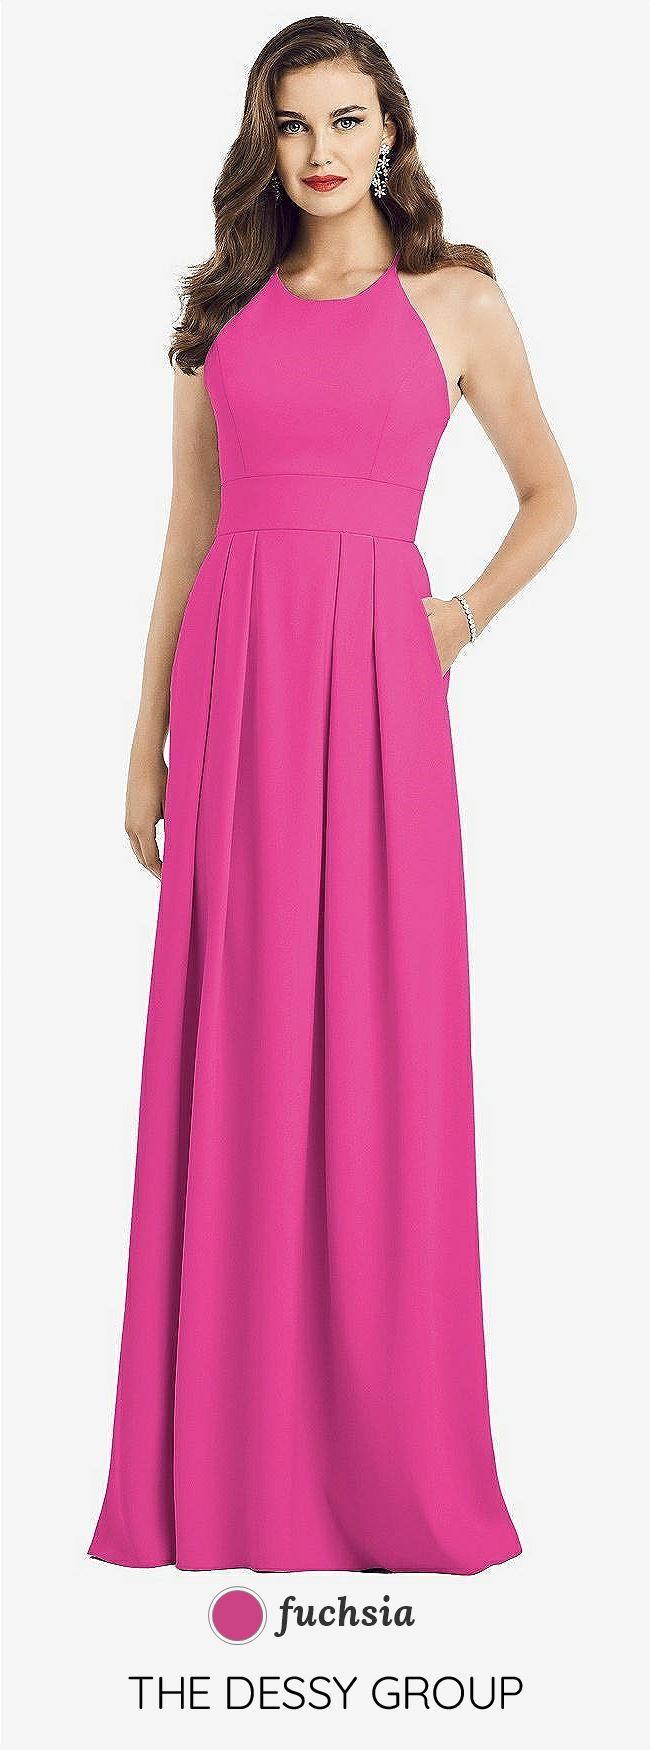 Stunning Fuchsia Pink Bridesmaid Dresses Hot Pink Bridesmaid Dresses Pink Bridesmaid Dresses Fuchsia Bridesmaid Dresses [ 1750 x 650 Pixel ]